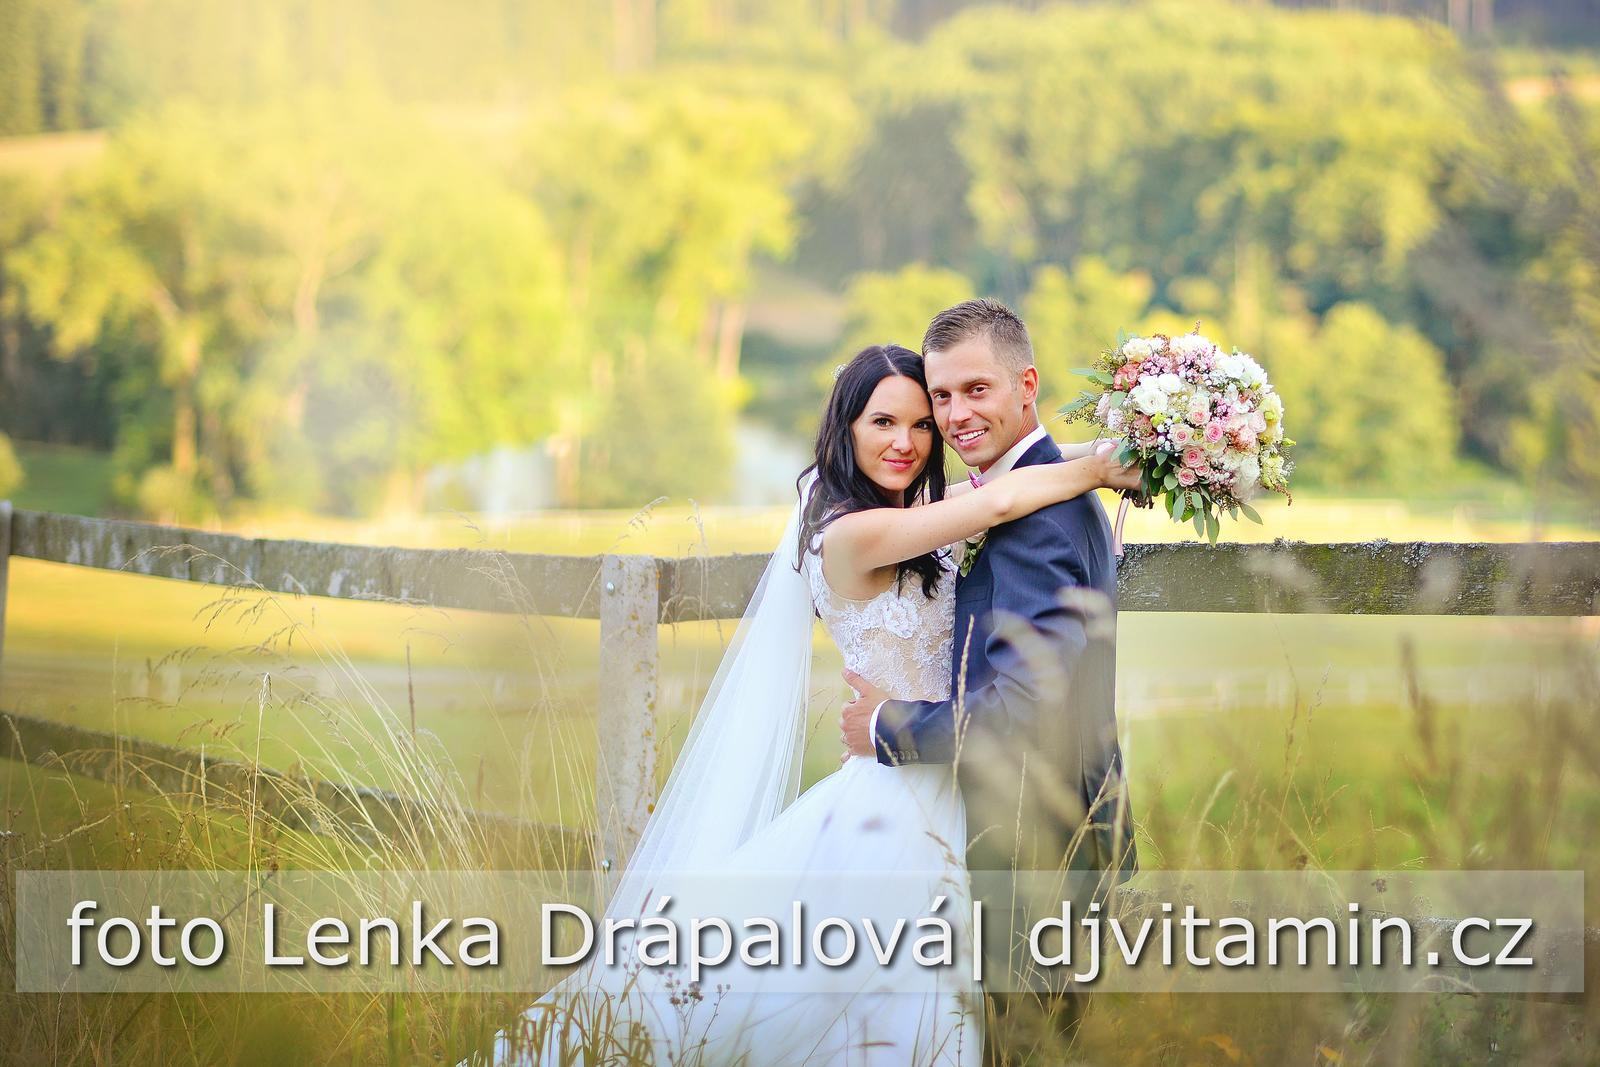 Svatba Kamila a Dominik, Dvůr Krůtěnice, Klatovy - Svatba Kamila a Dominik, Dvůr Krůtěnice, Klatovy